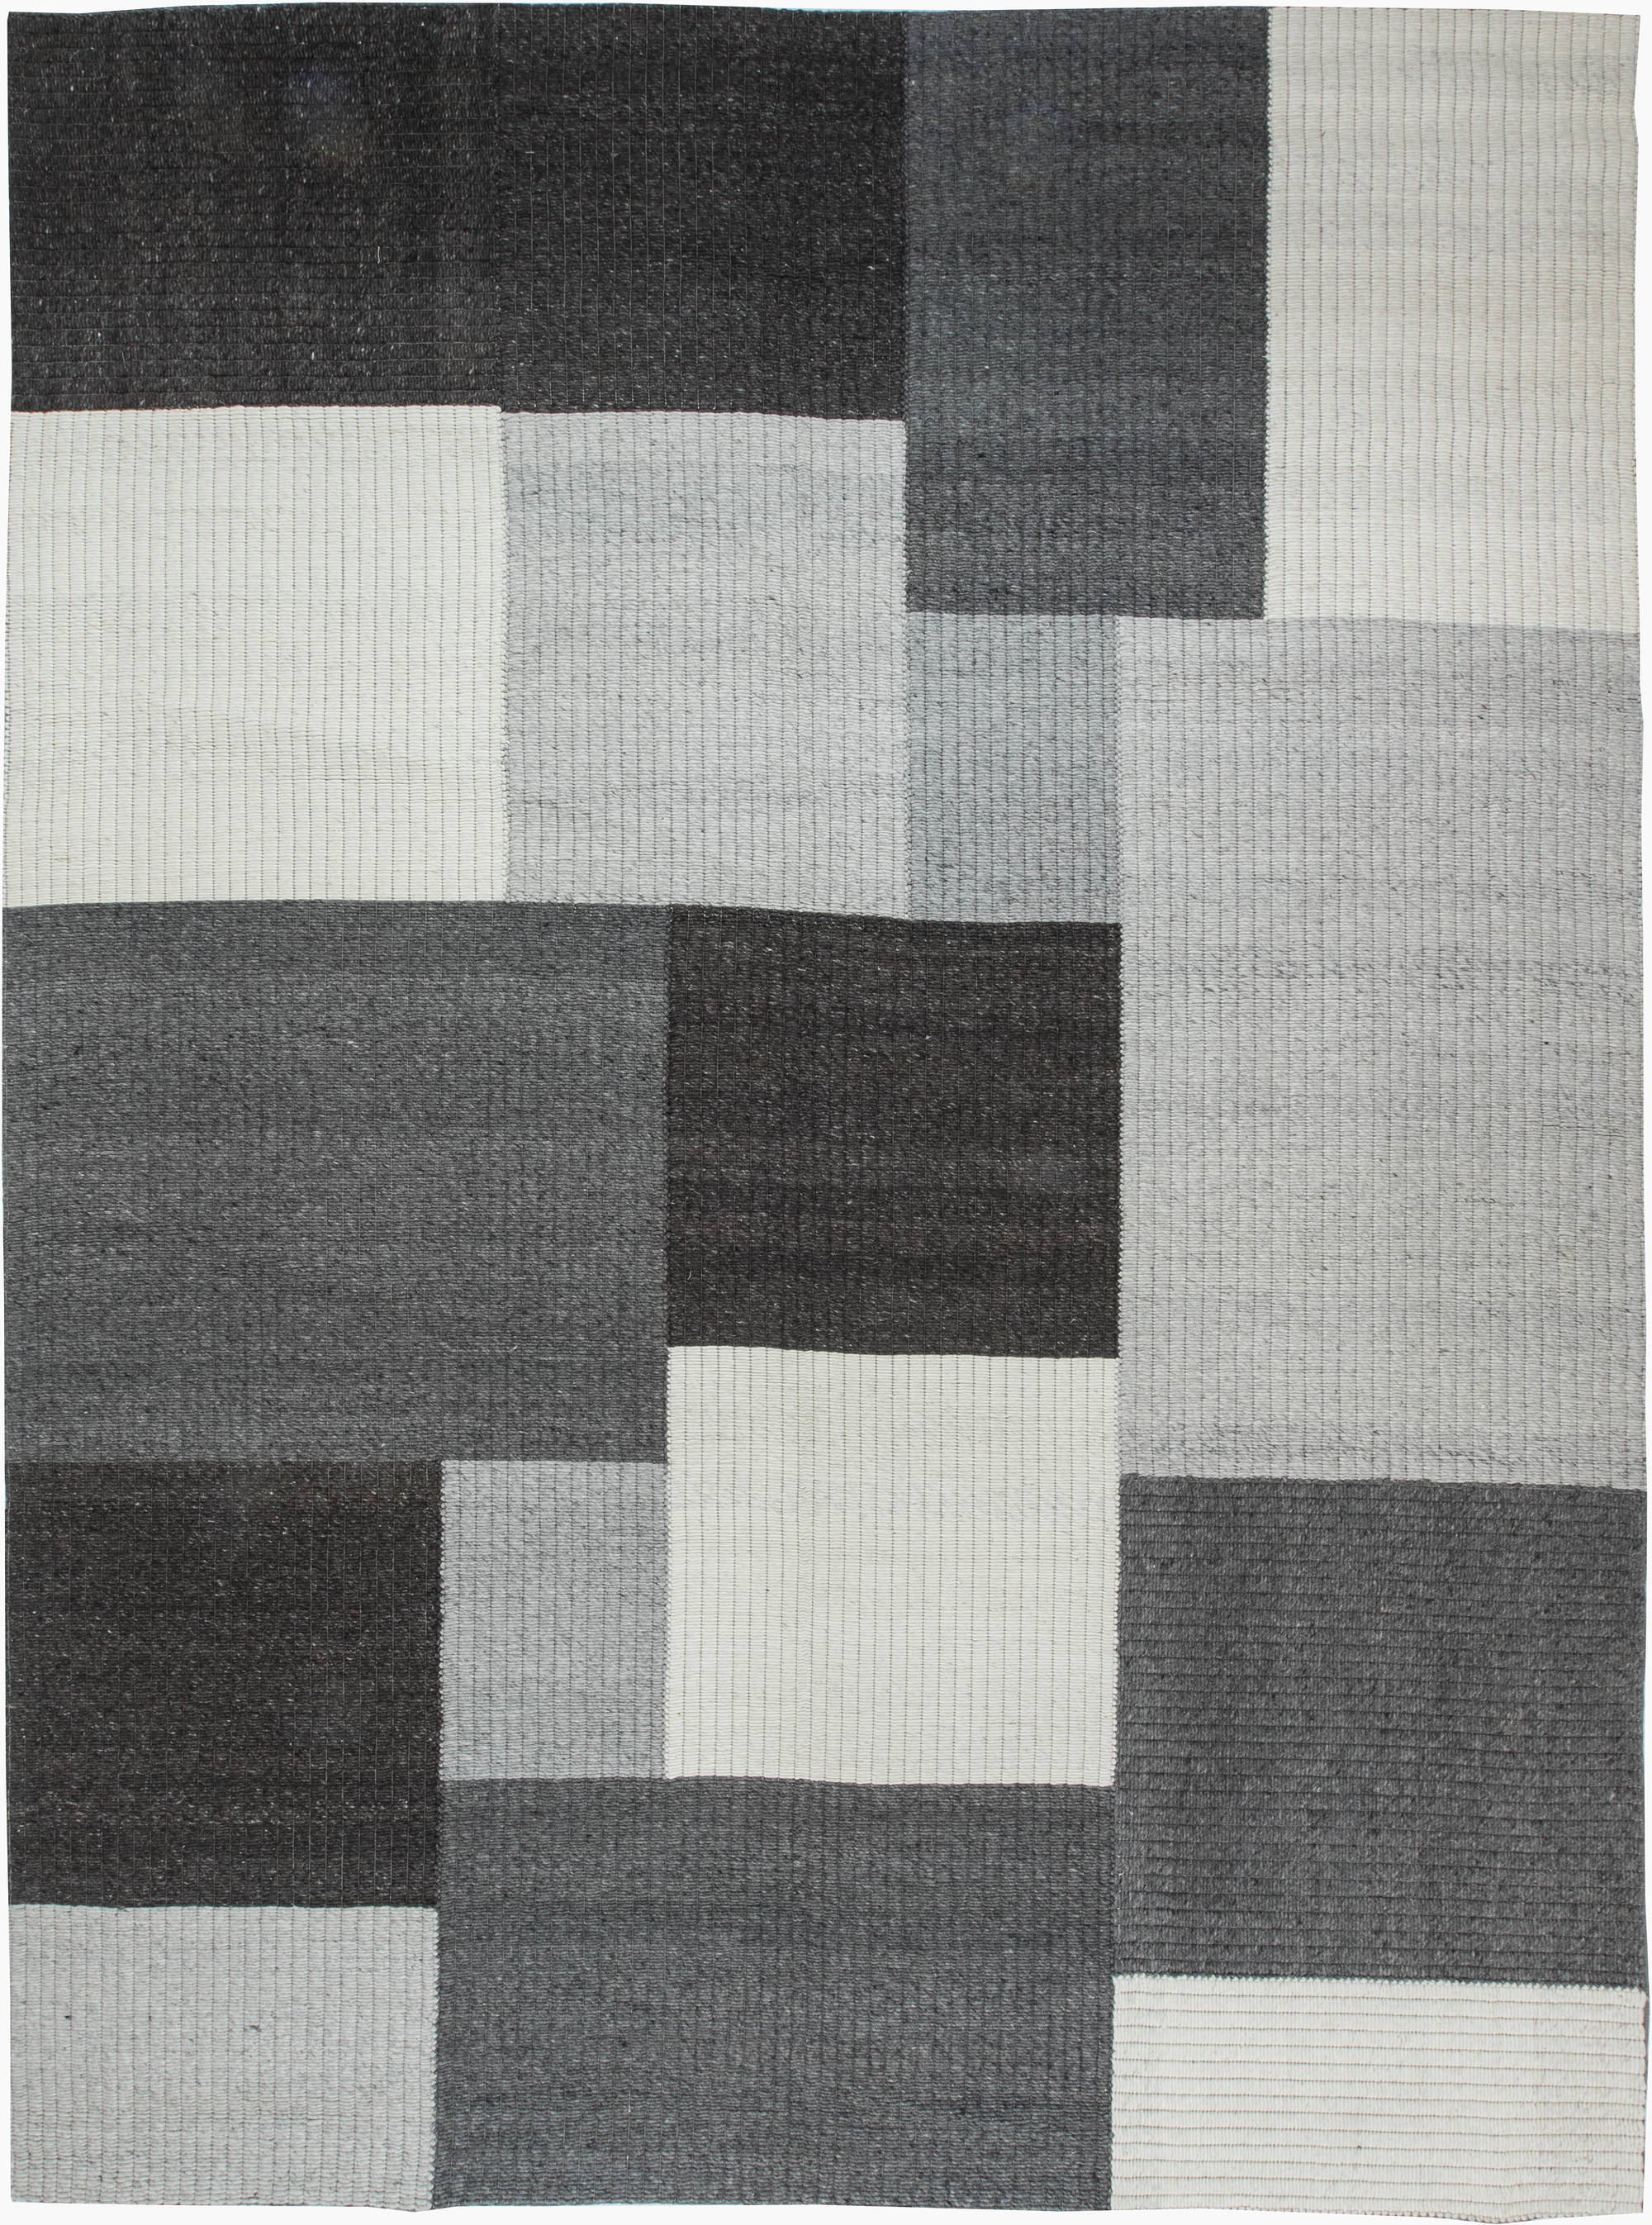 contemporary rug modern flat weave carpet n11587. arrow down  47161db02bae4ef92bdede423862e8f0c2b91f81311572b5a8bb90eef3001a34 IWMIMWG